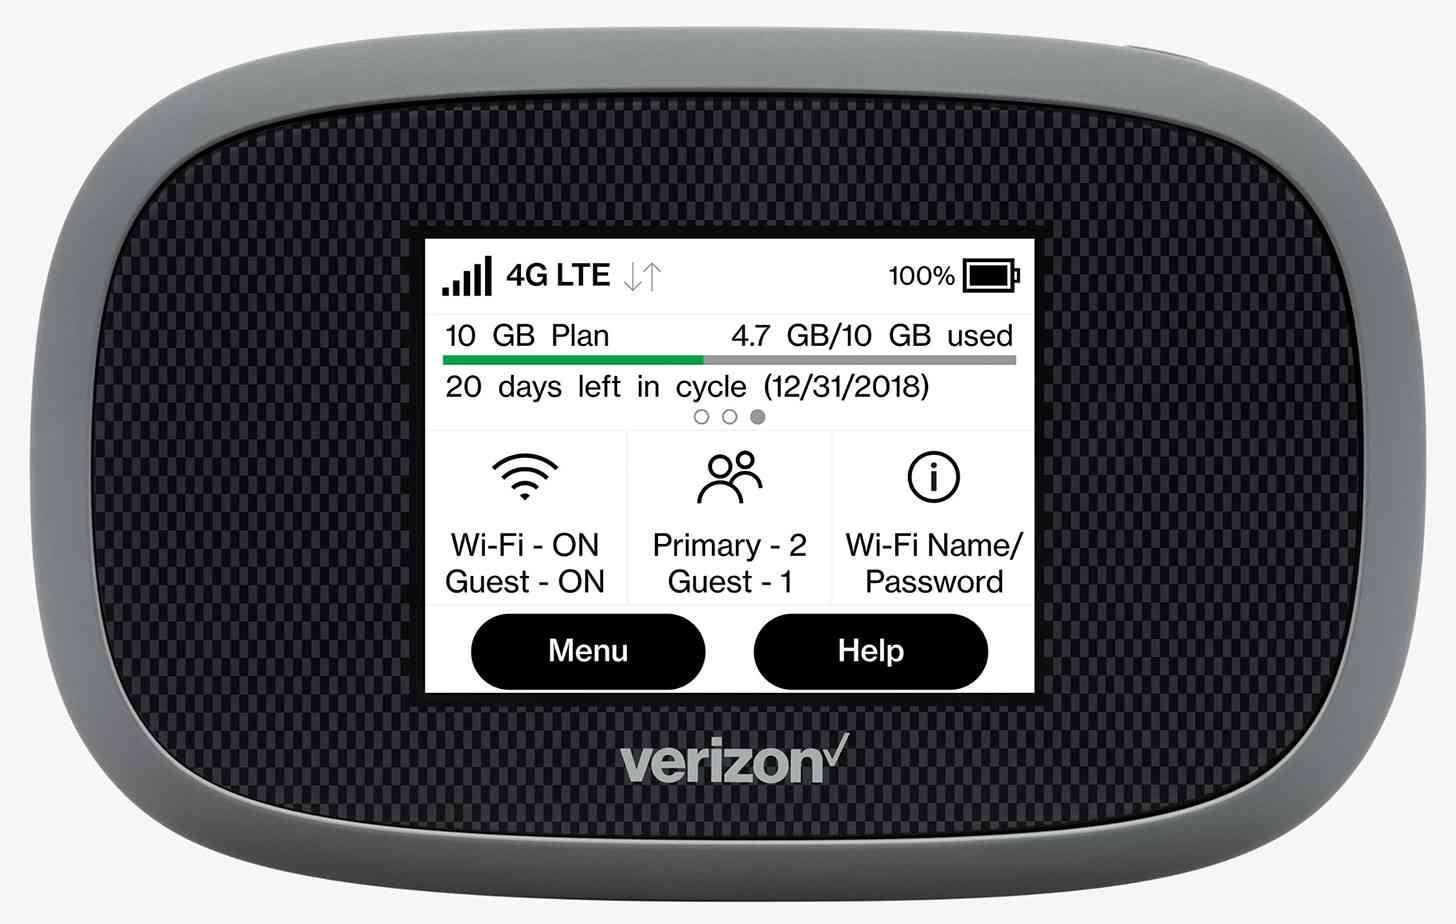 Verizon Jetpack MiFi 8800L mobile hotspot official